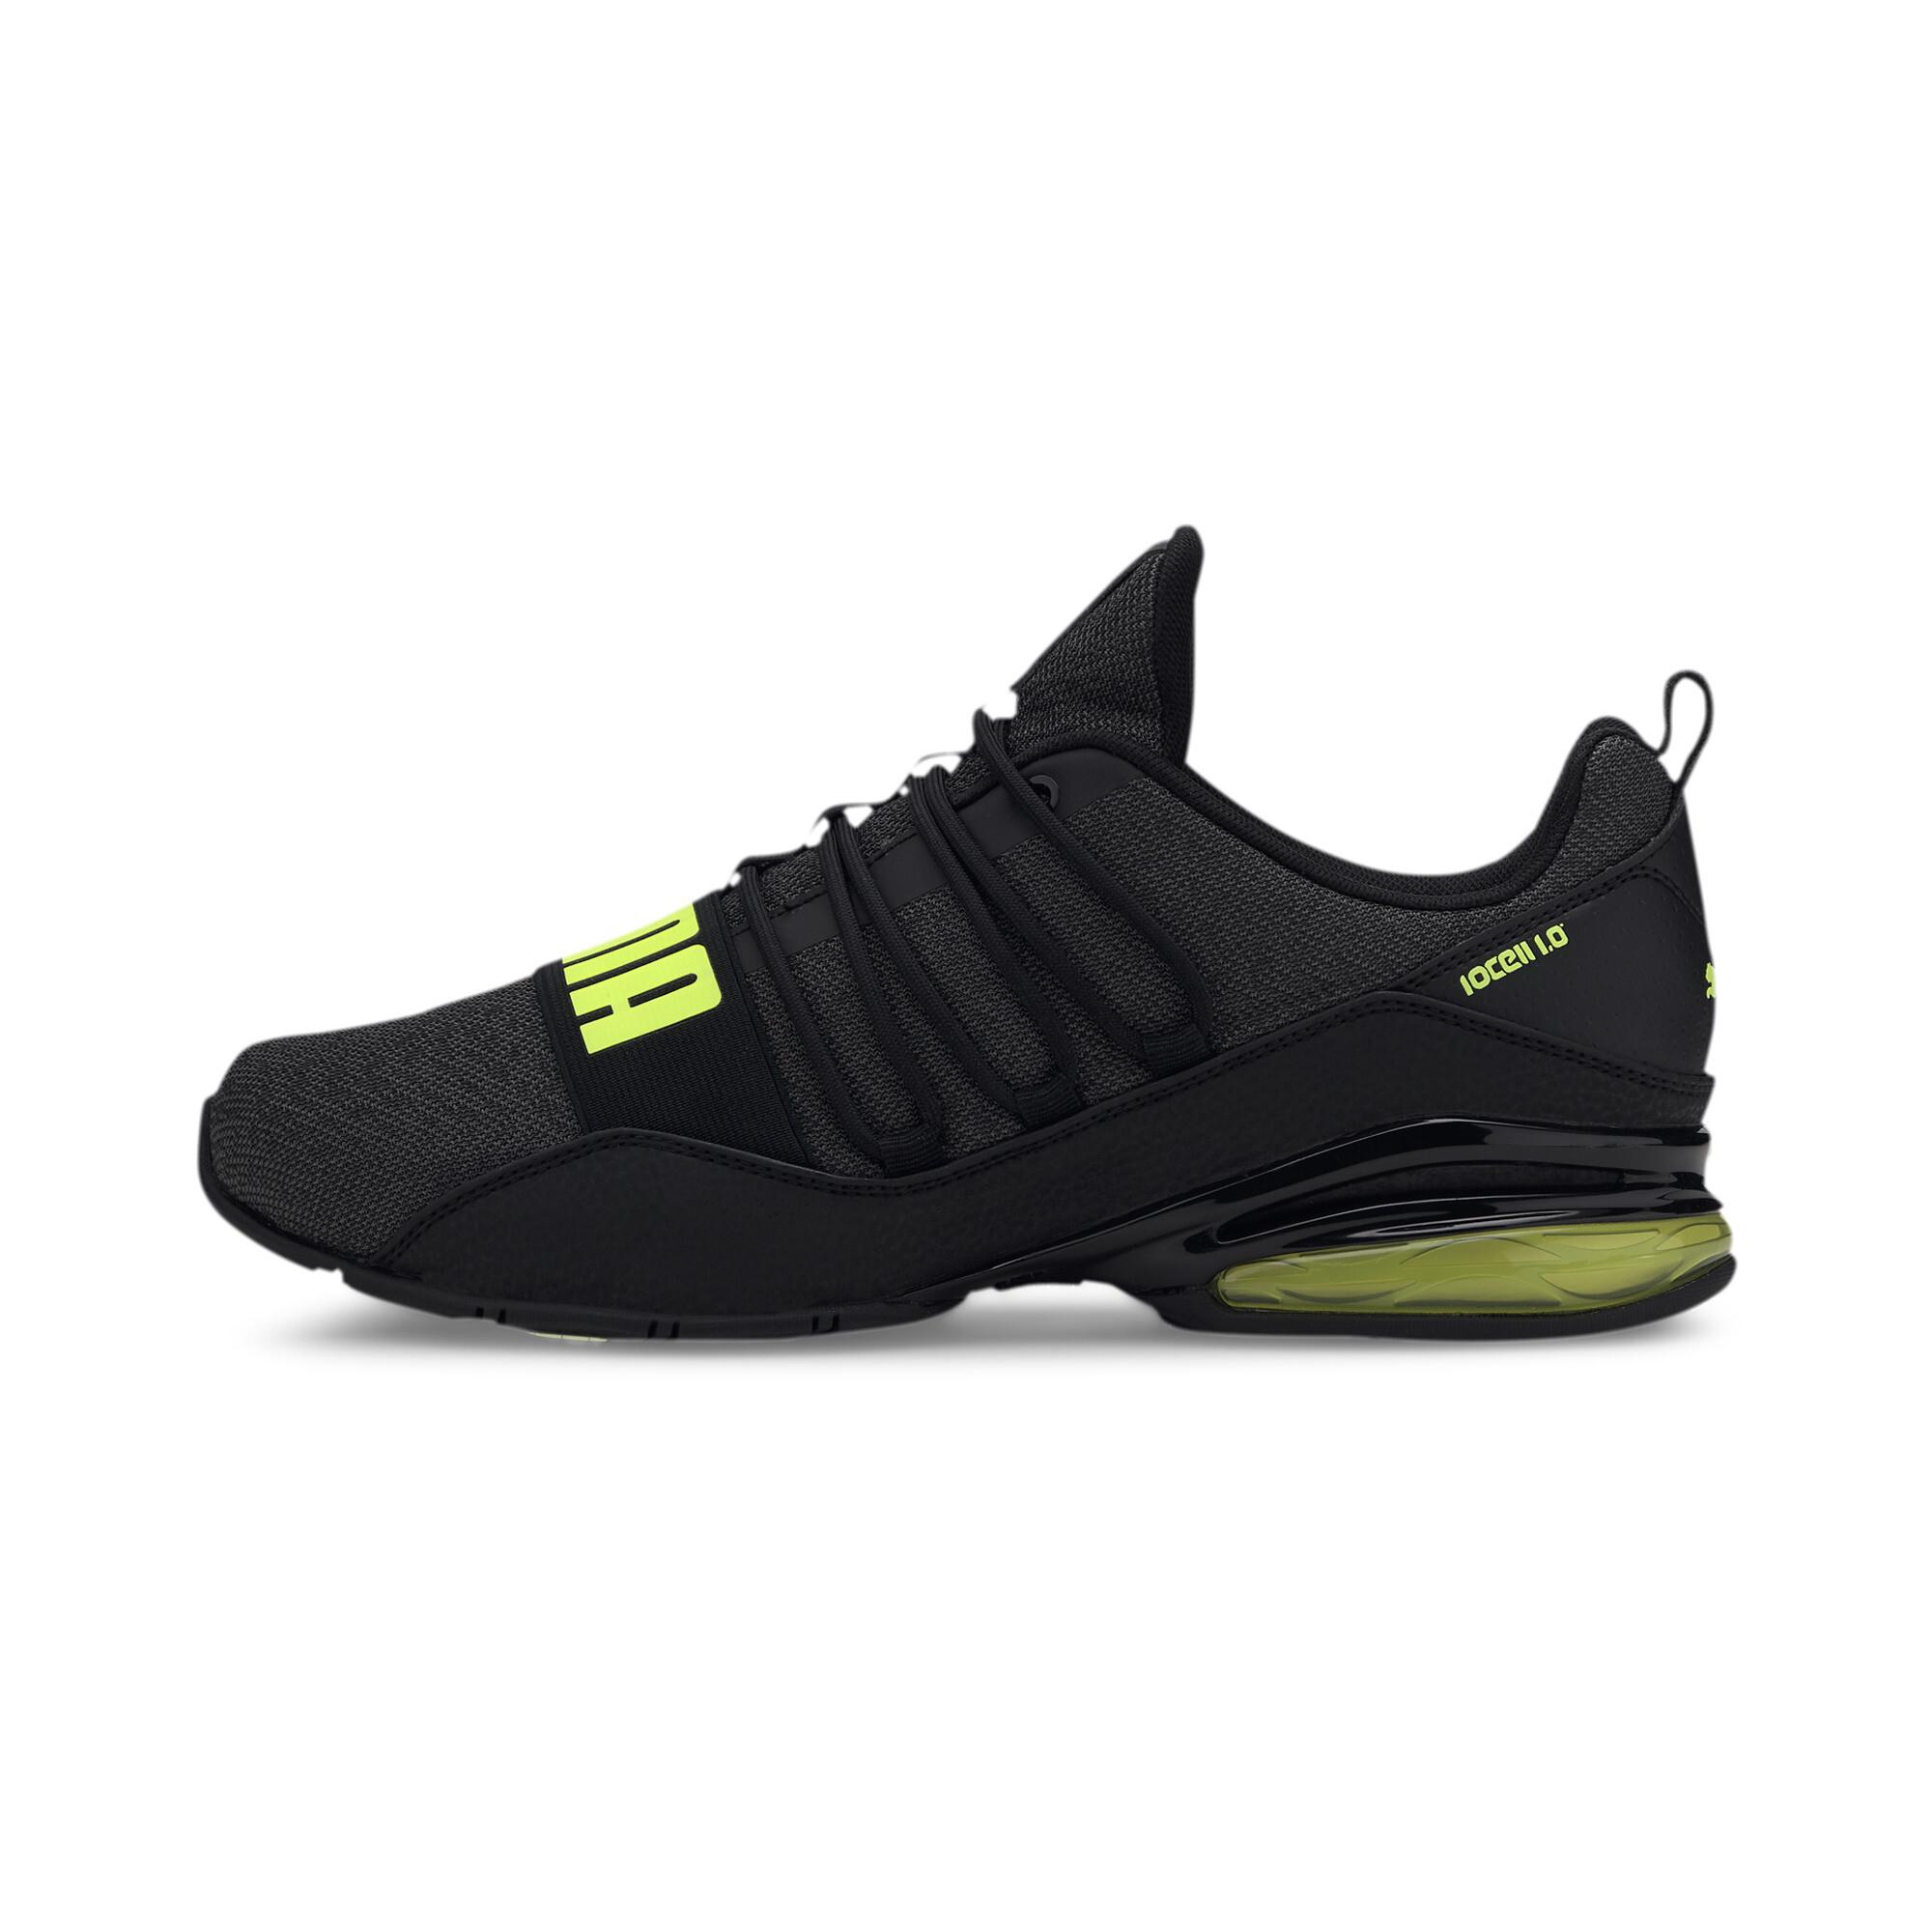 PUMA-Men-039-s-CELL-Regulate-Bold-Training-Shoes thumbnail 18